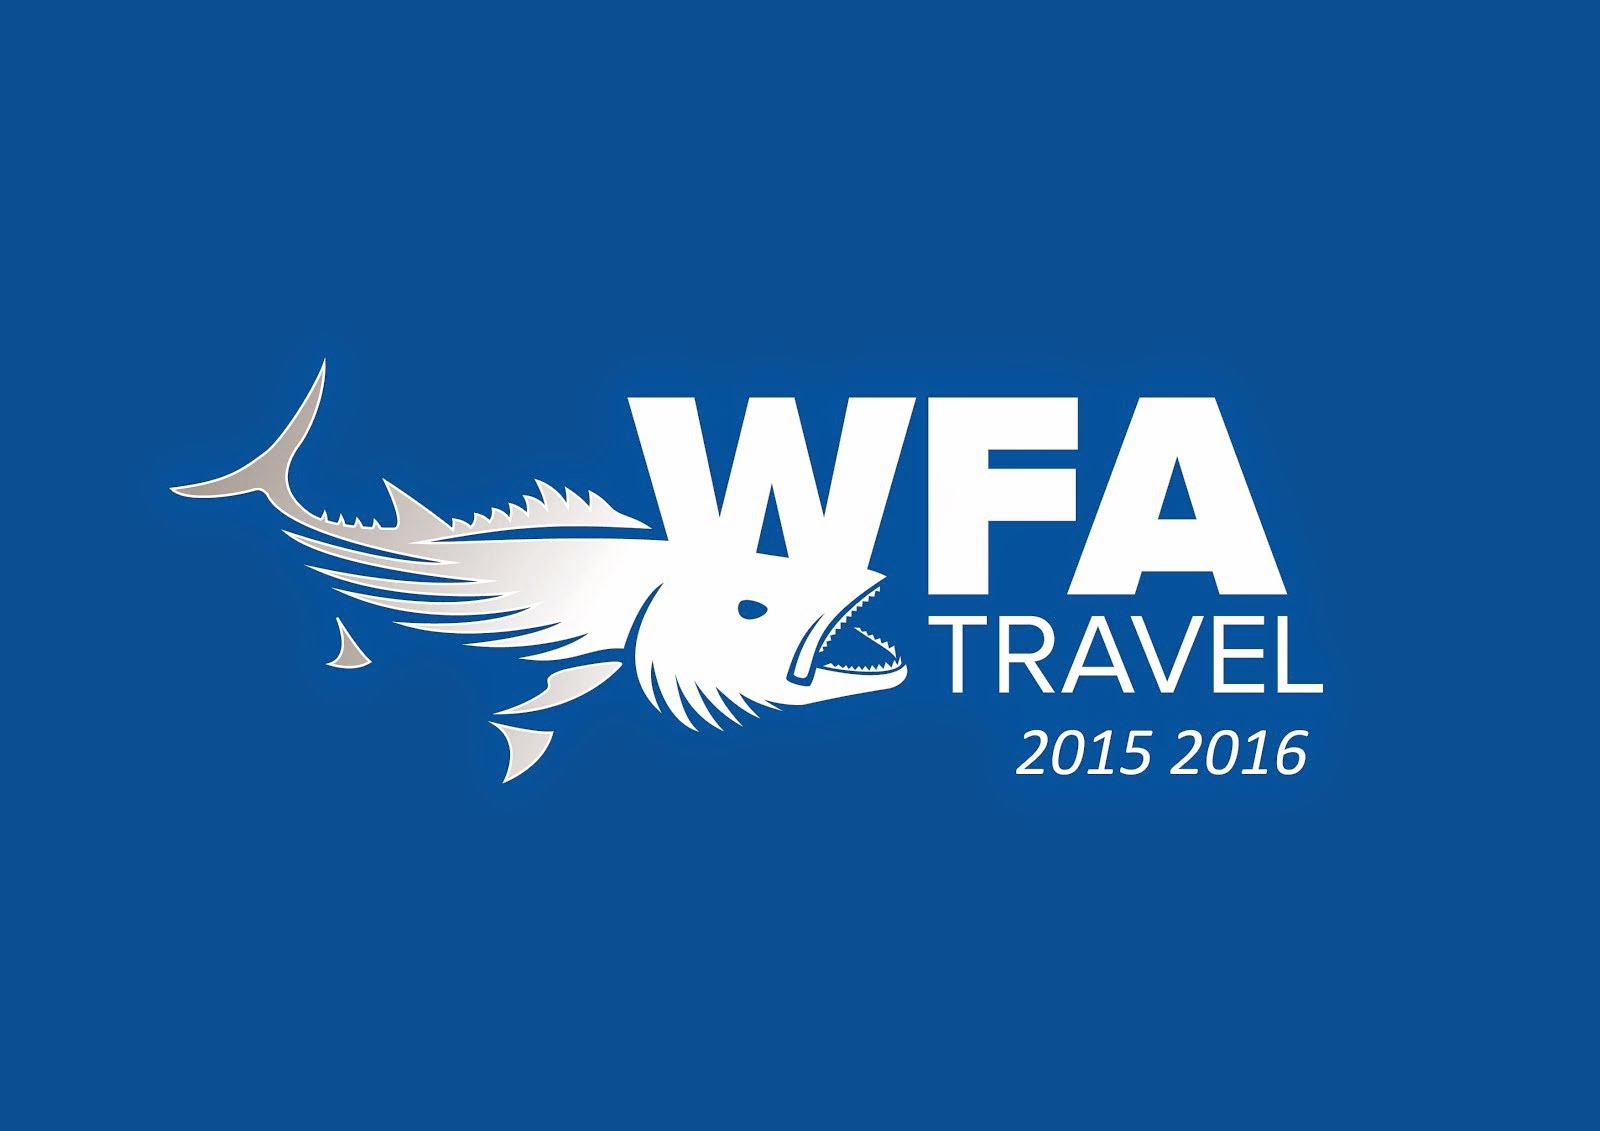 WFA FISHING TRIP 2015 - 2016